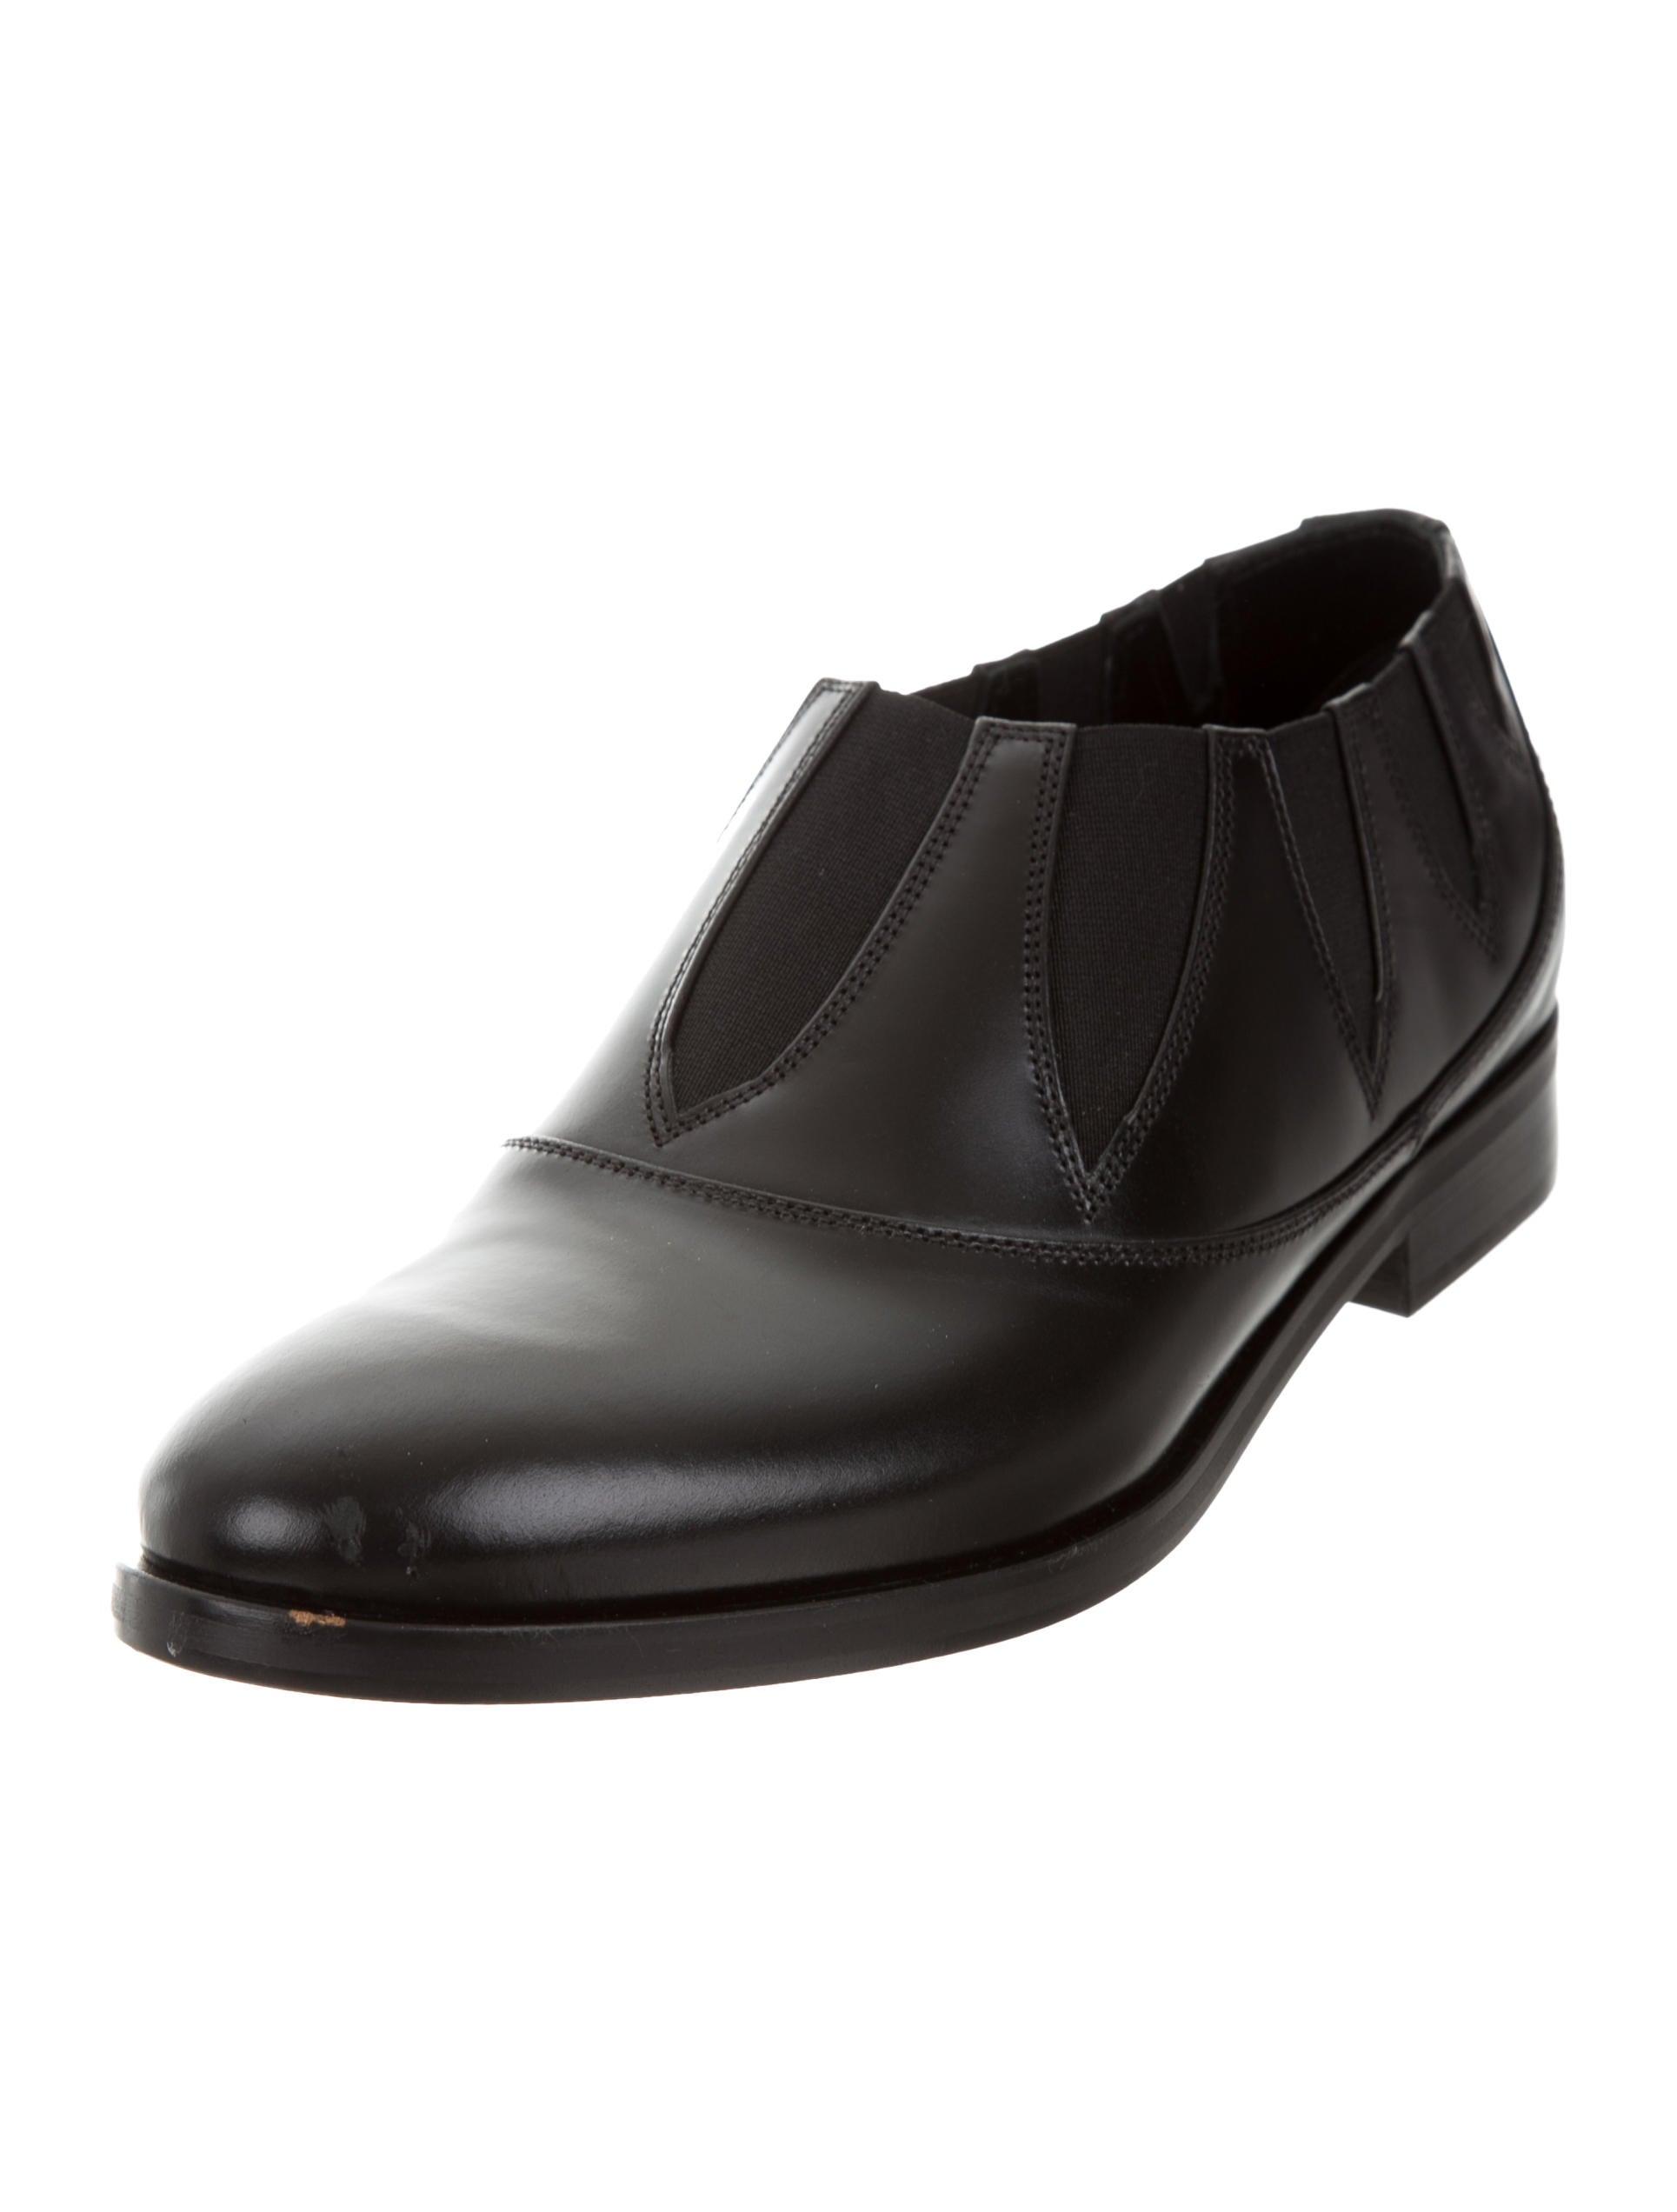 Alaïa Leather Laser Cut Loafers w/ Tags footlocker online Q8mjC8V7CQ